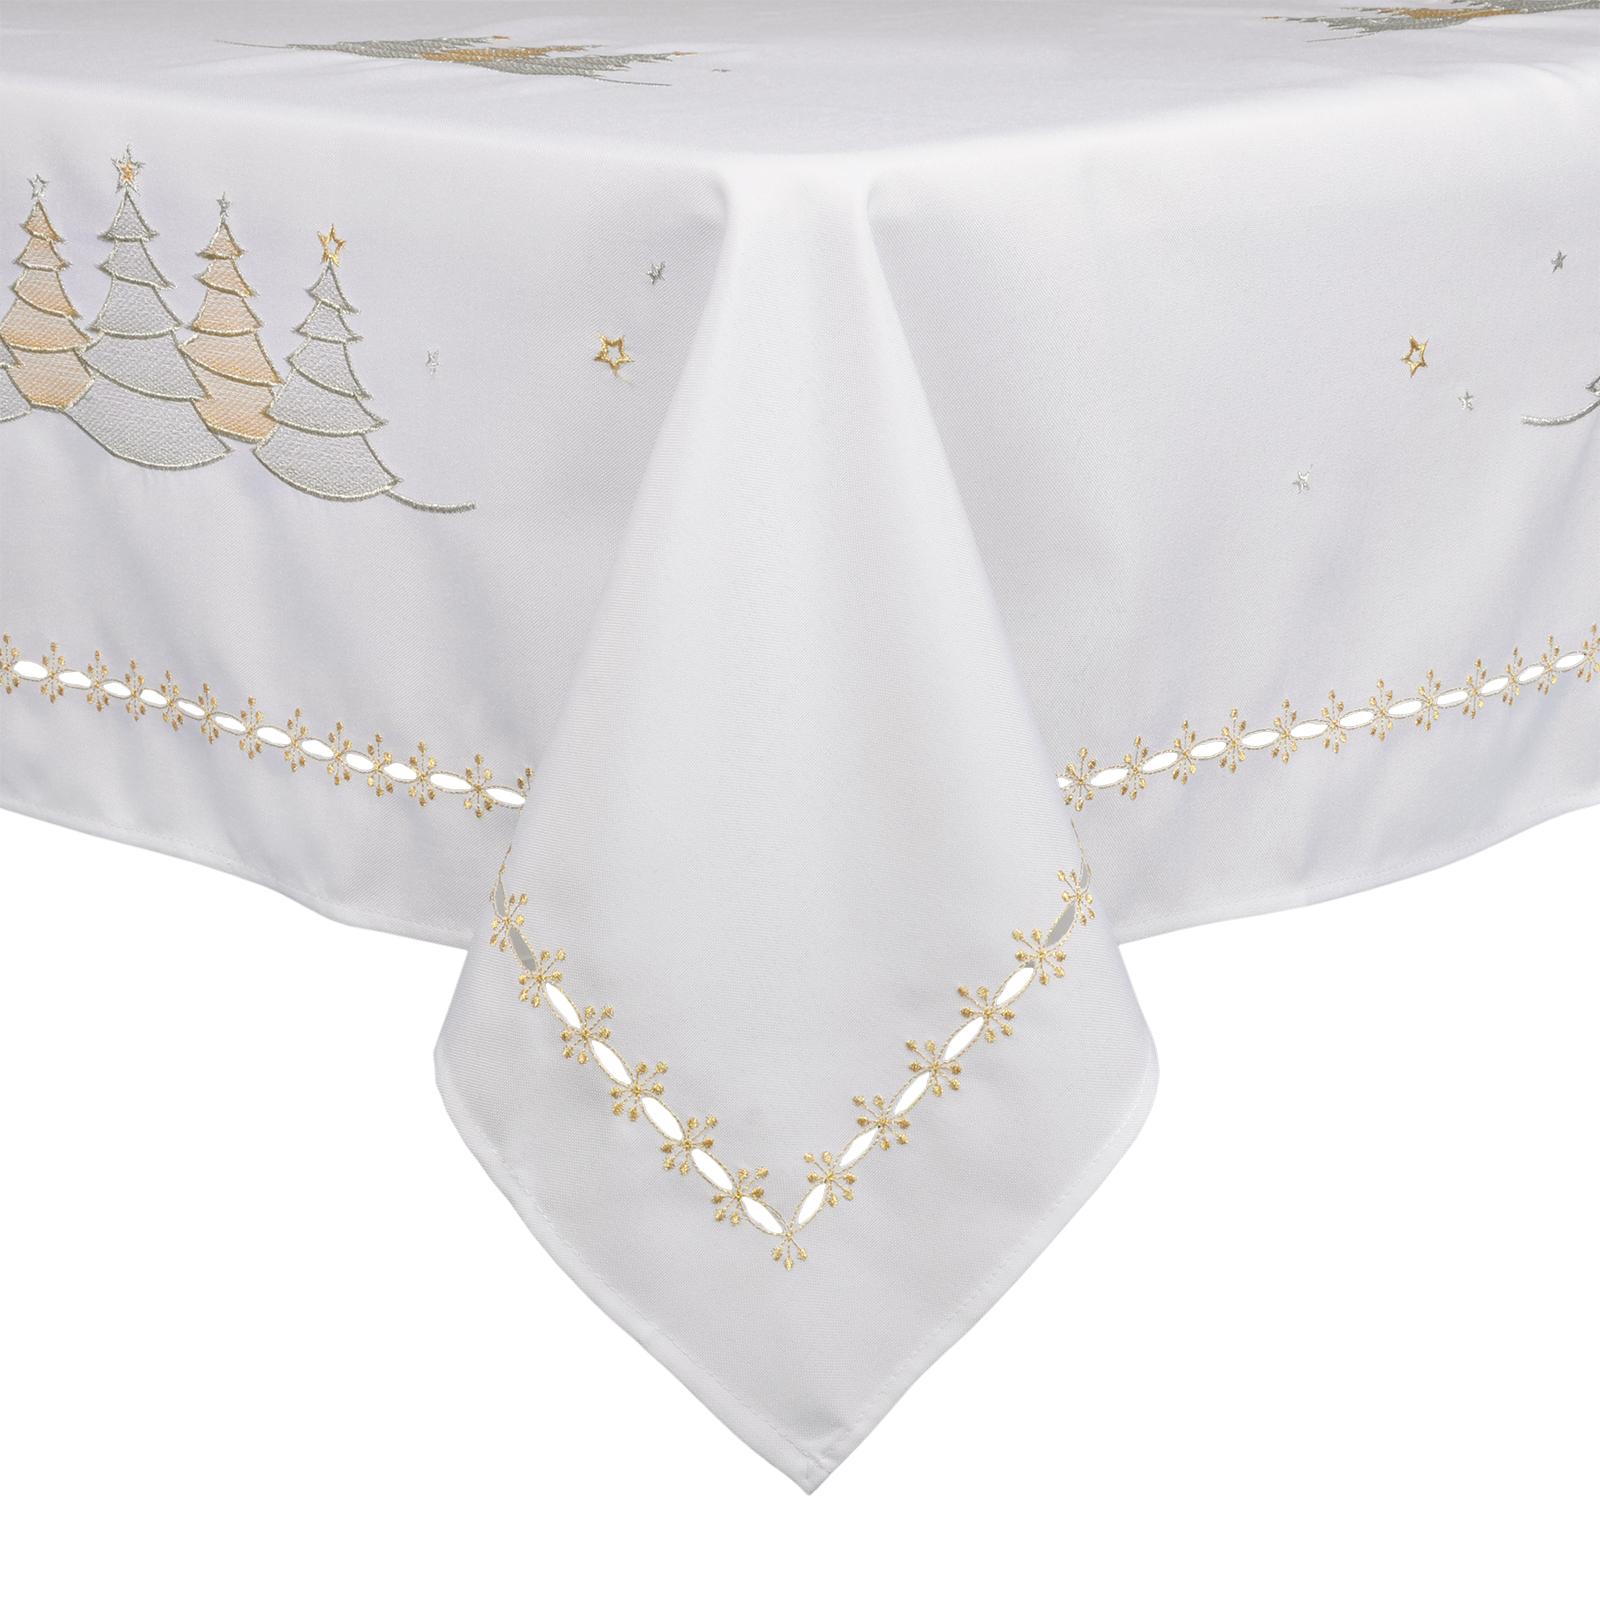 White Christmas Tree Tablecloth Festive Xmas Room  : XS4779 XS47805f1 1600 from www.ebay.co.uk size 1600 x 1600 jpeg 1060kB